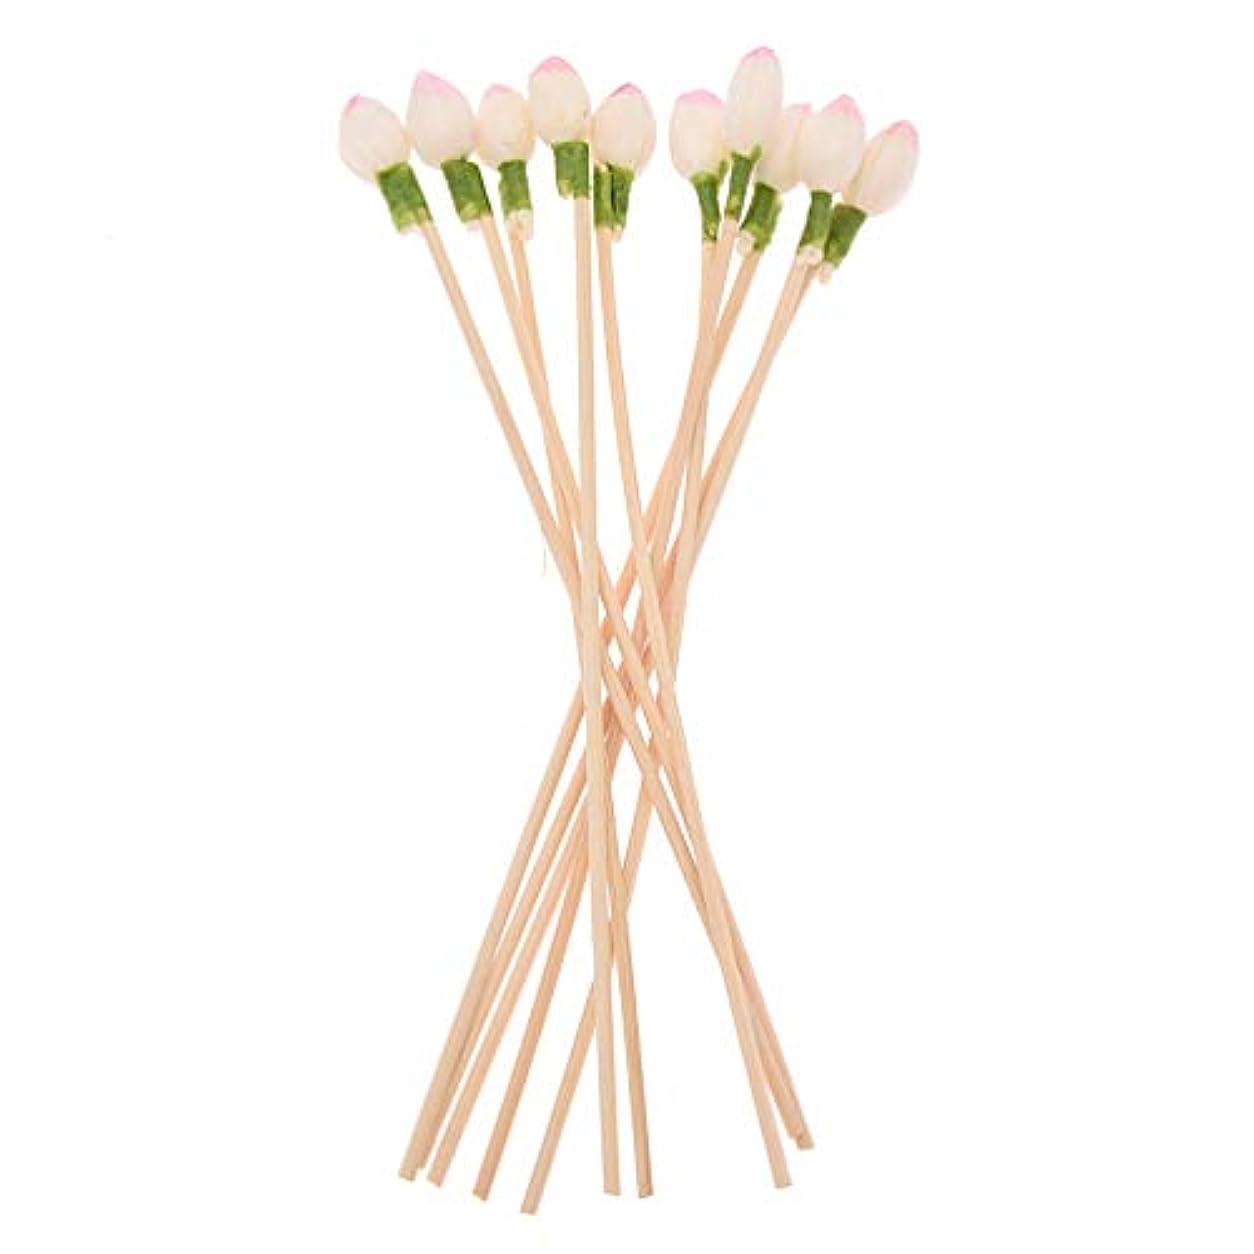 Viviseason (ビビシーズン)10本セット ラタンスティック 人工花芽 リードディフューザー用 リフィル 高品質 クラフト